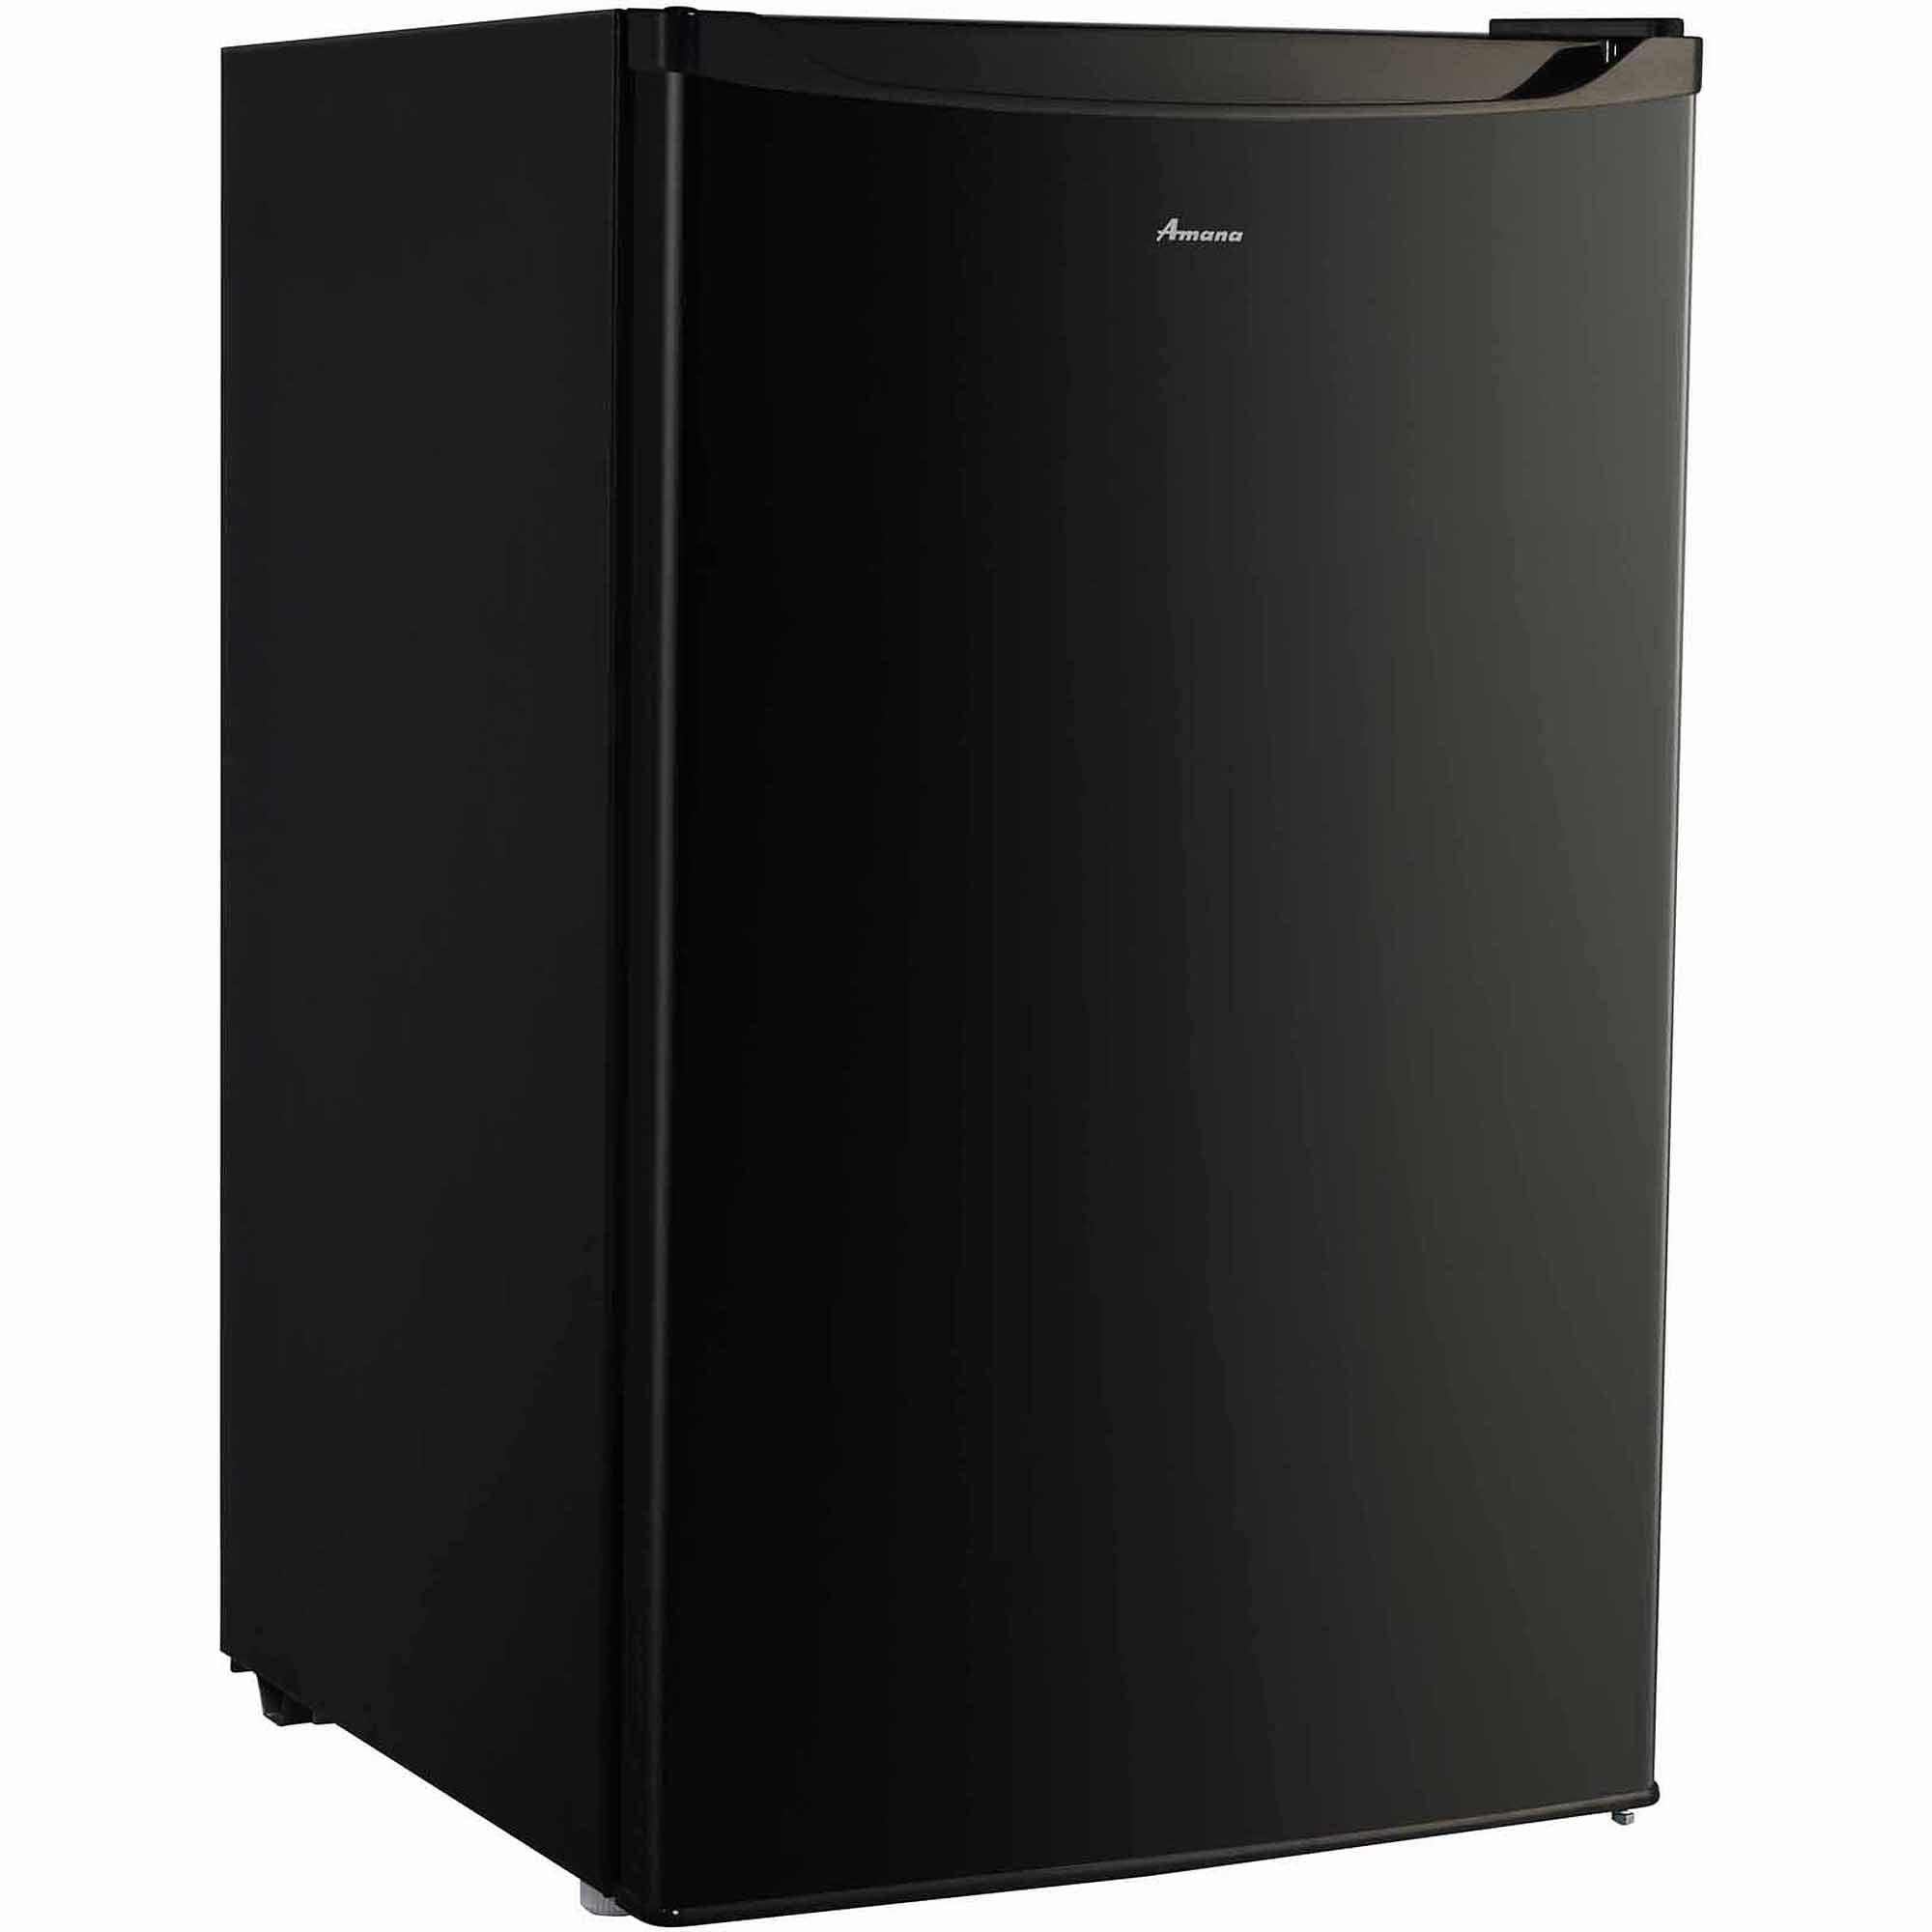 Amana 4.3 cu ft Compact Single-Door Refrigerator, Black